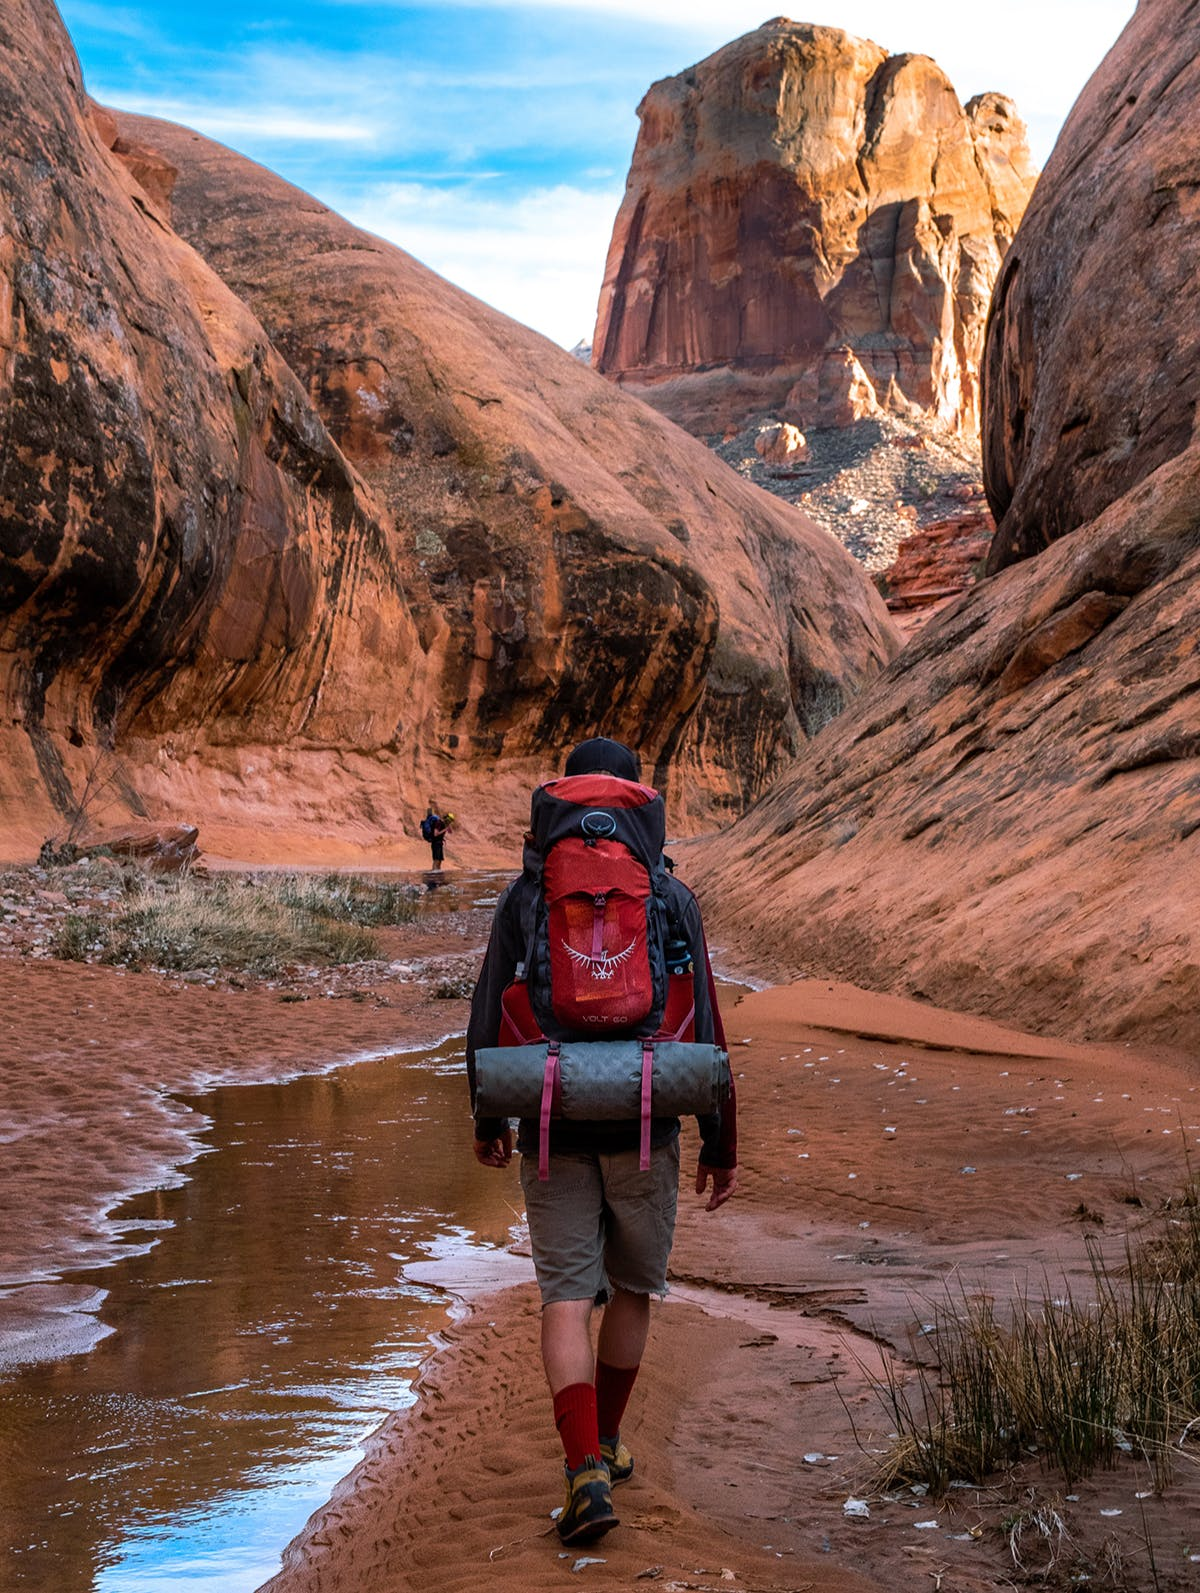 Camping & Hiking Expert Kael Van Buskirk